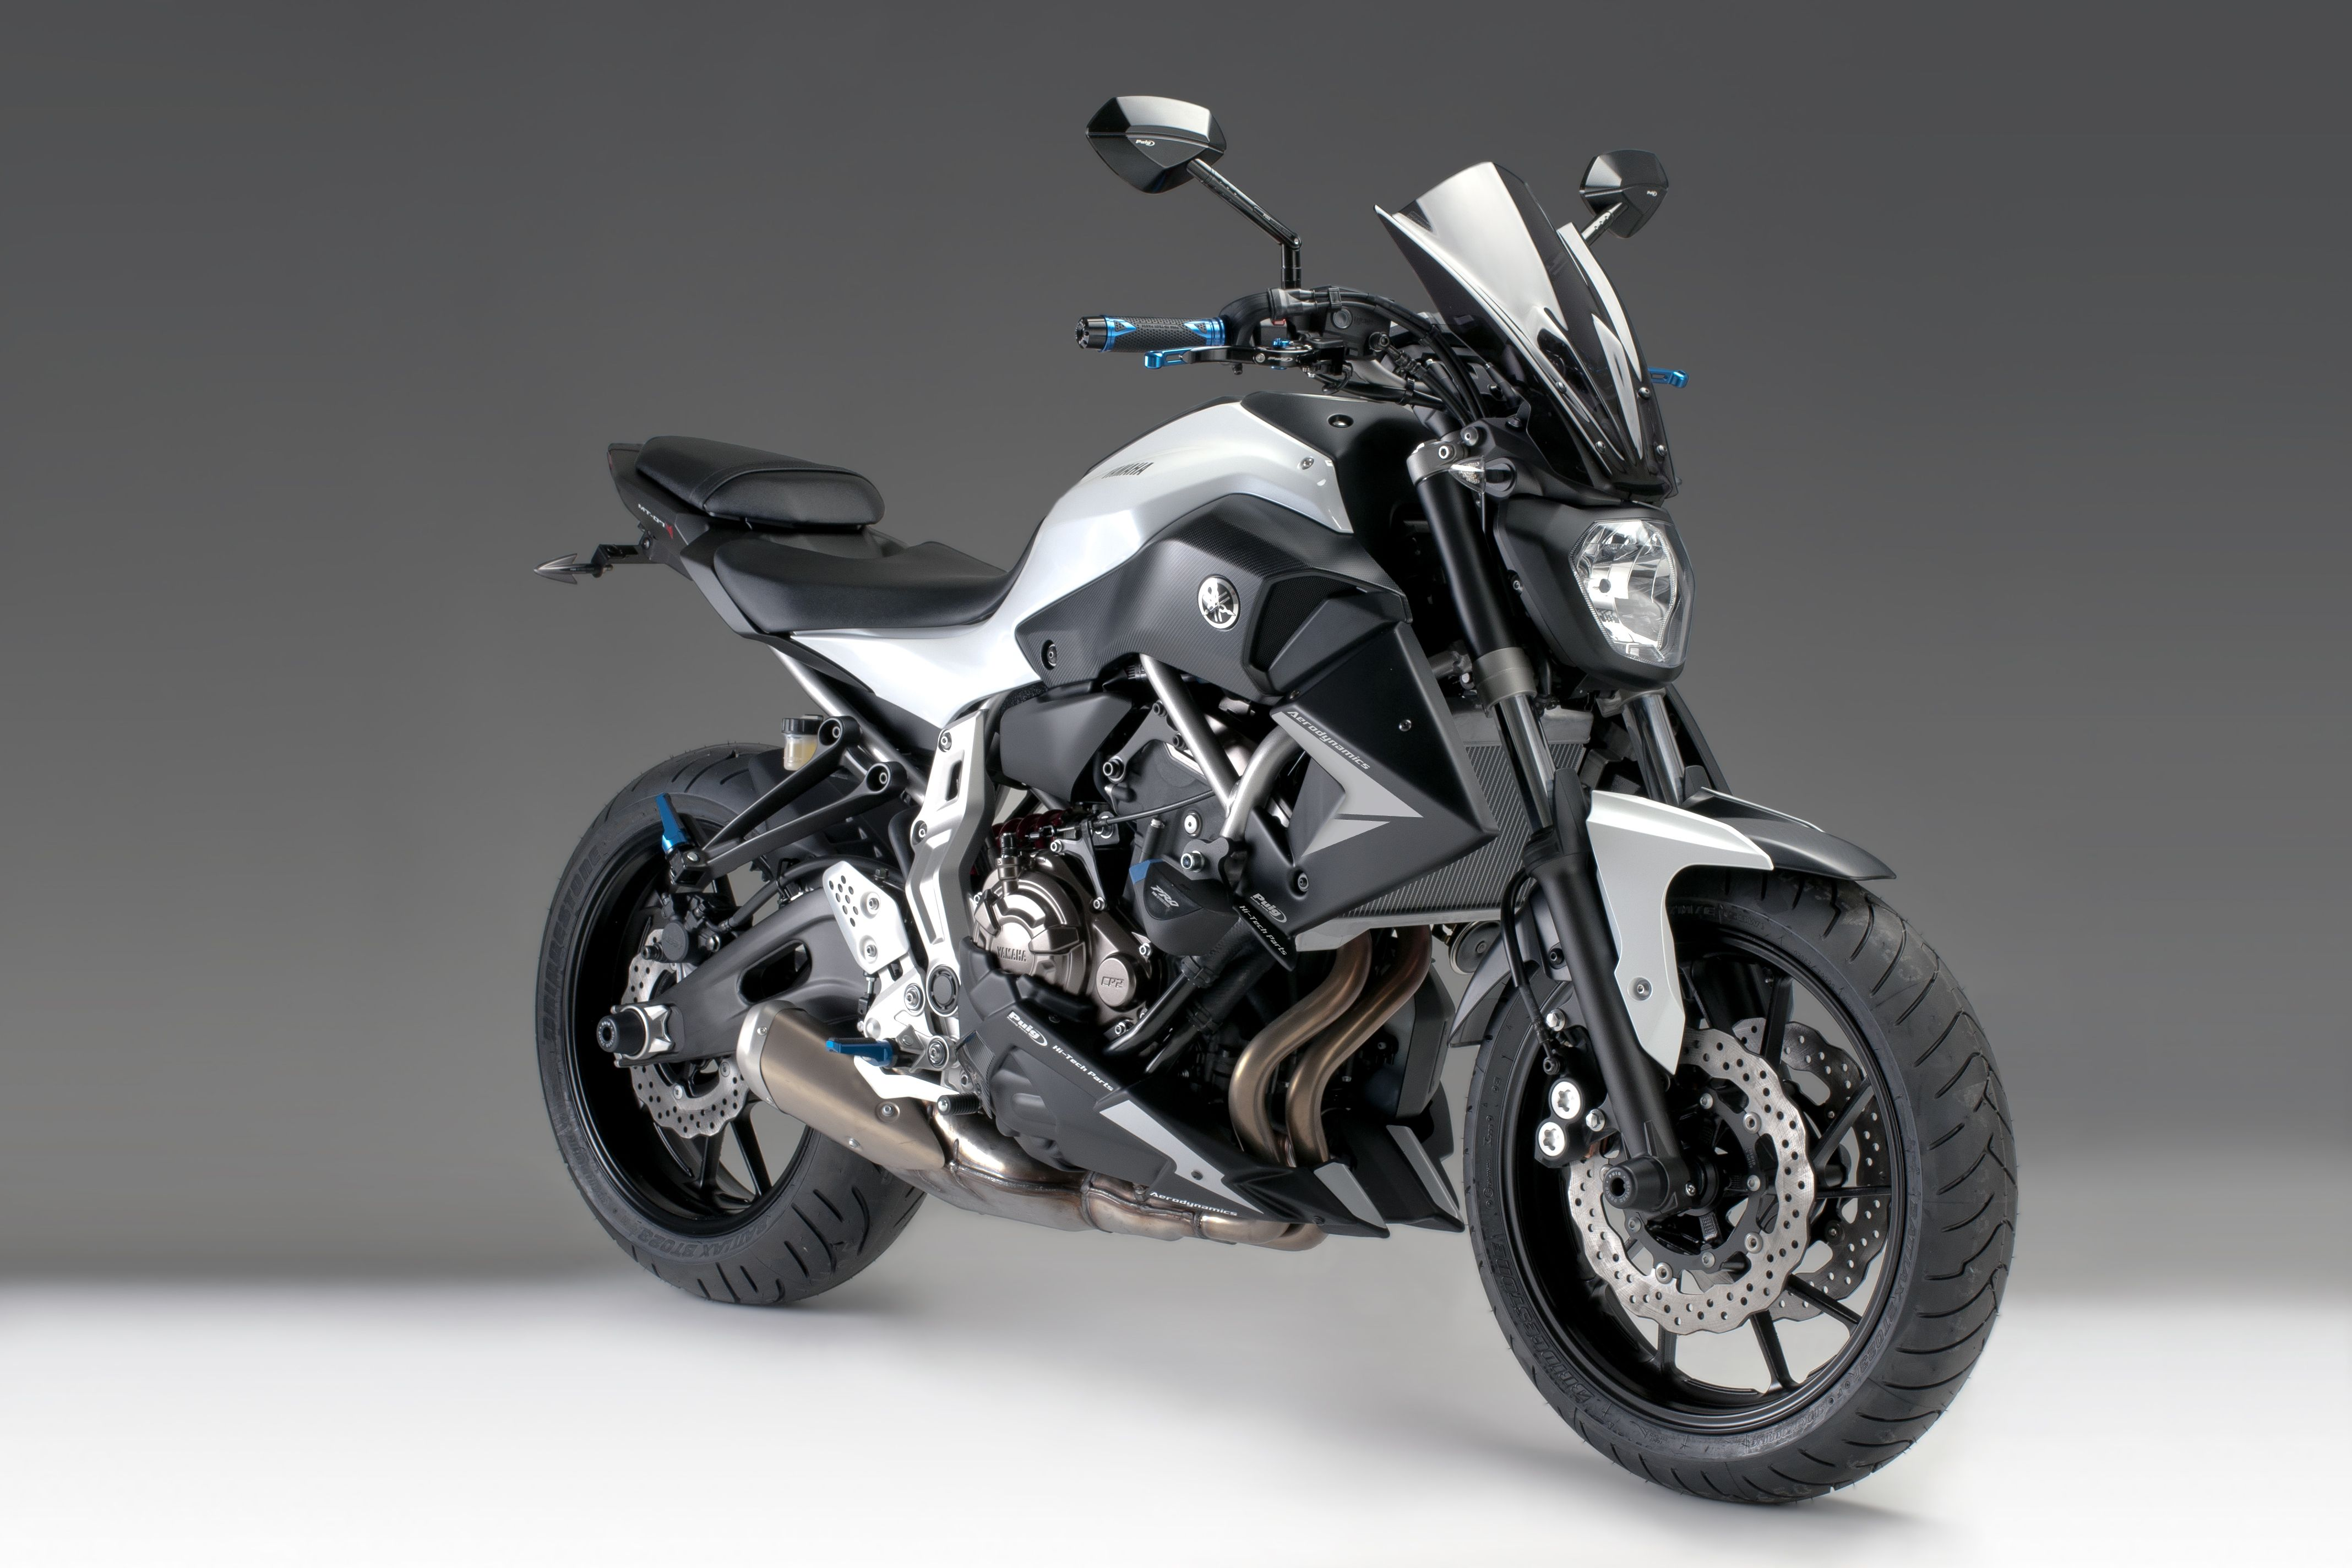 Puigtv Tuning Motos Yamaha Mt 07 2015 C171es M6687